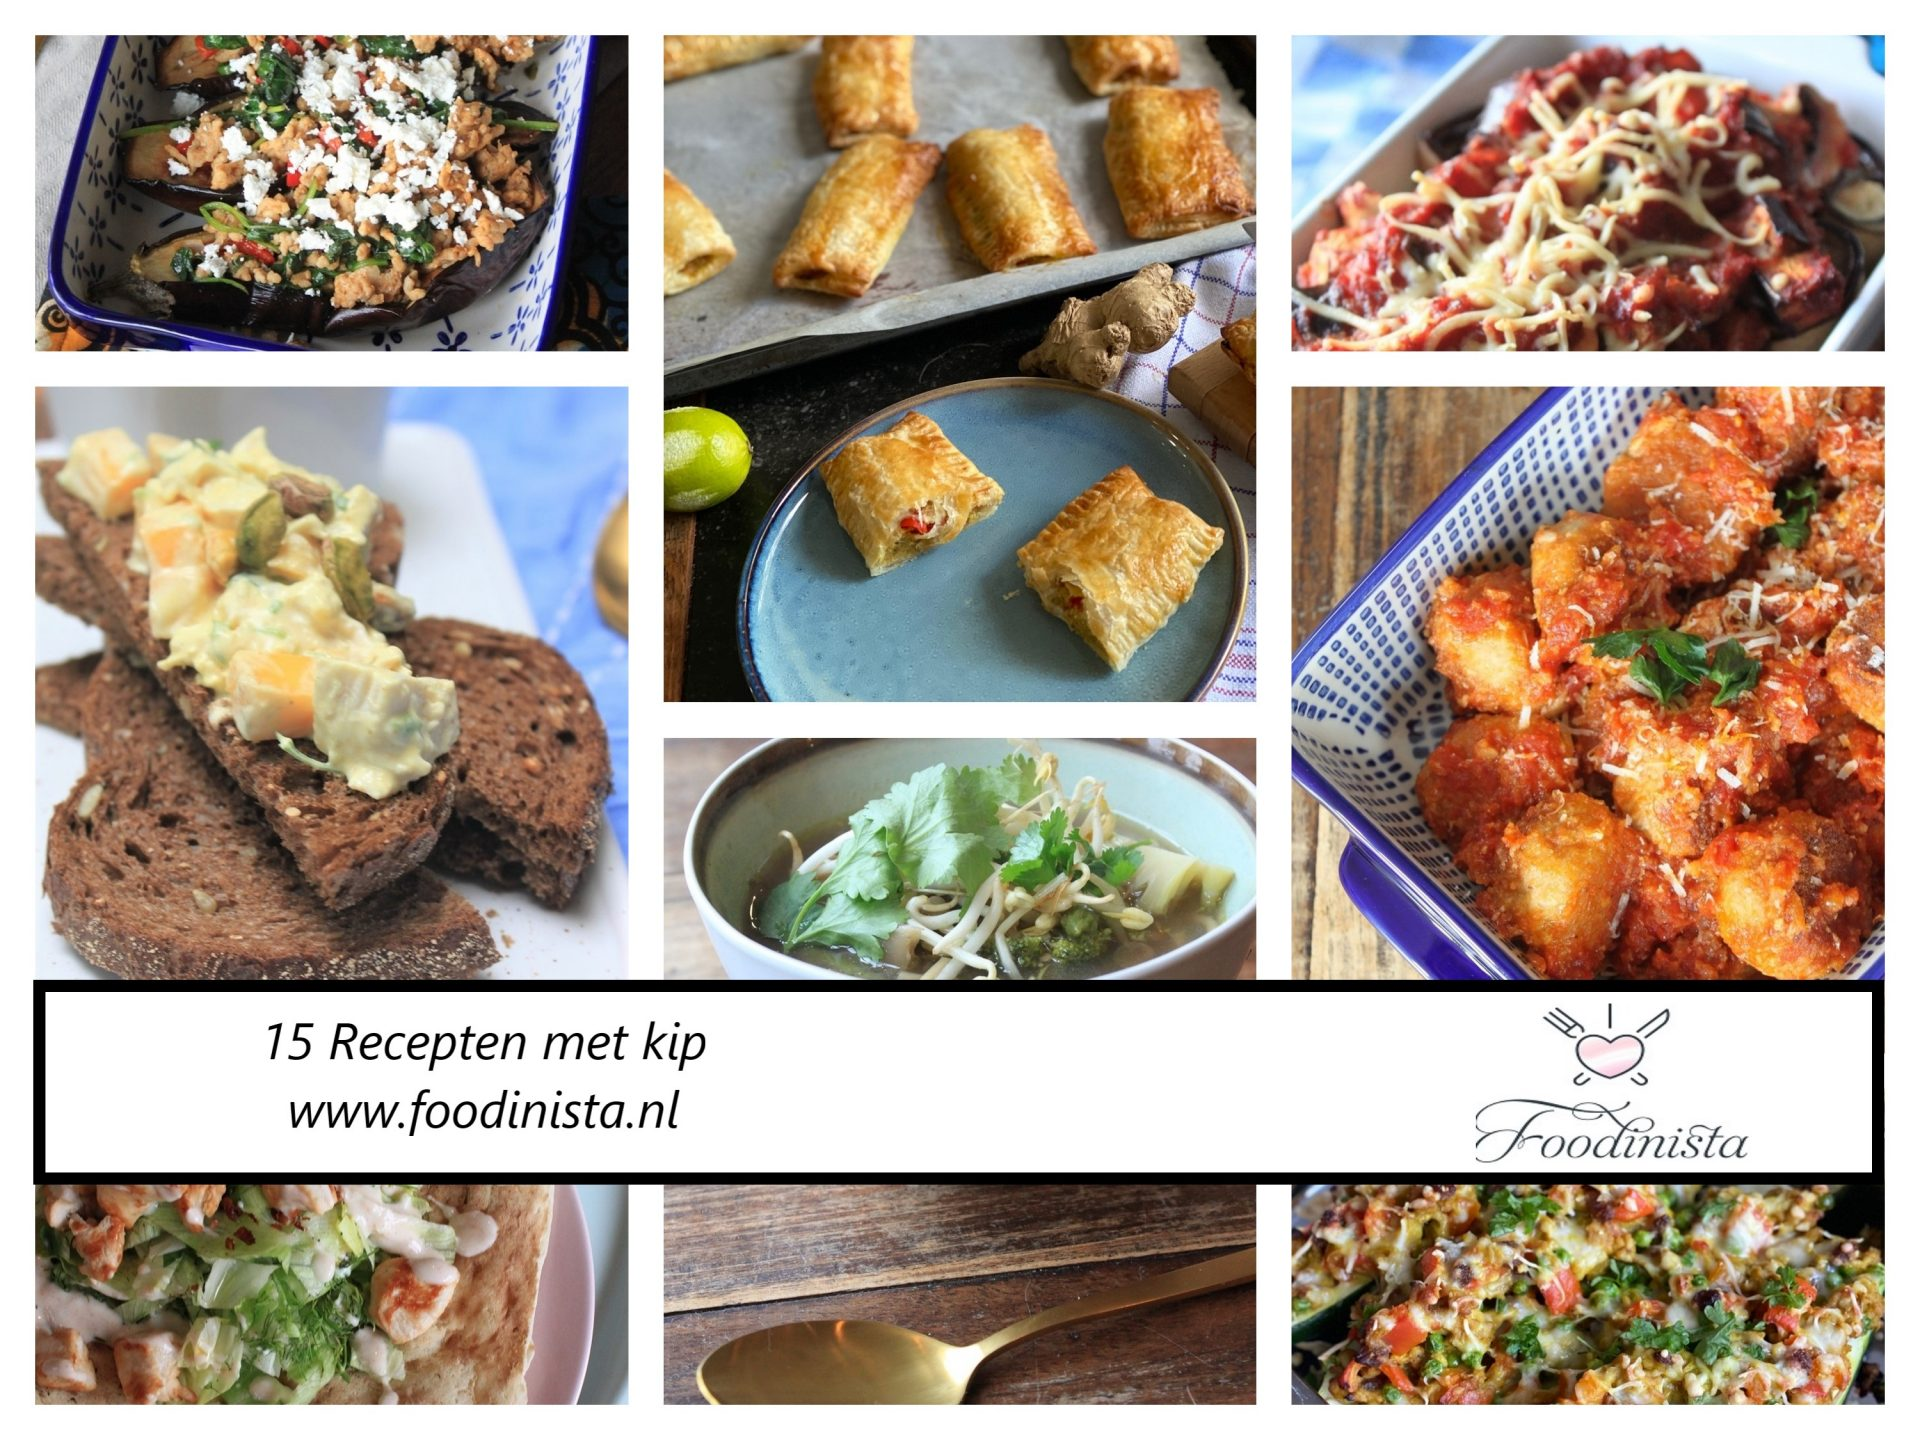 15x Kook ideeën met kip - Foodblog Foodinista